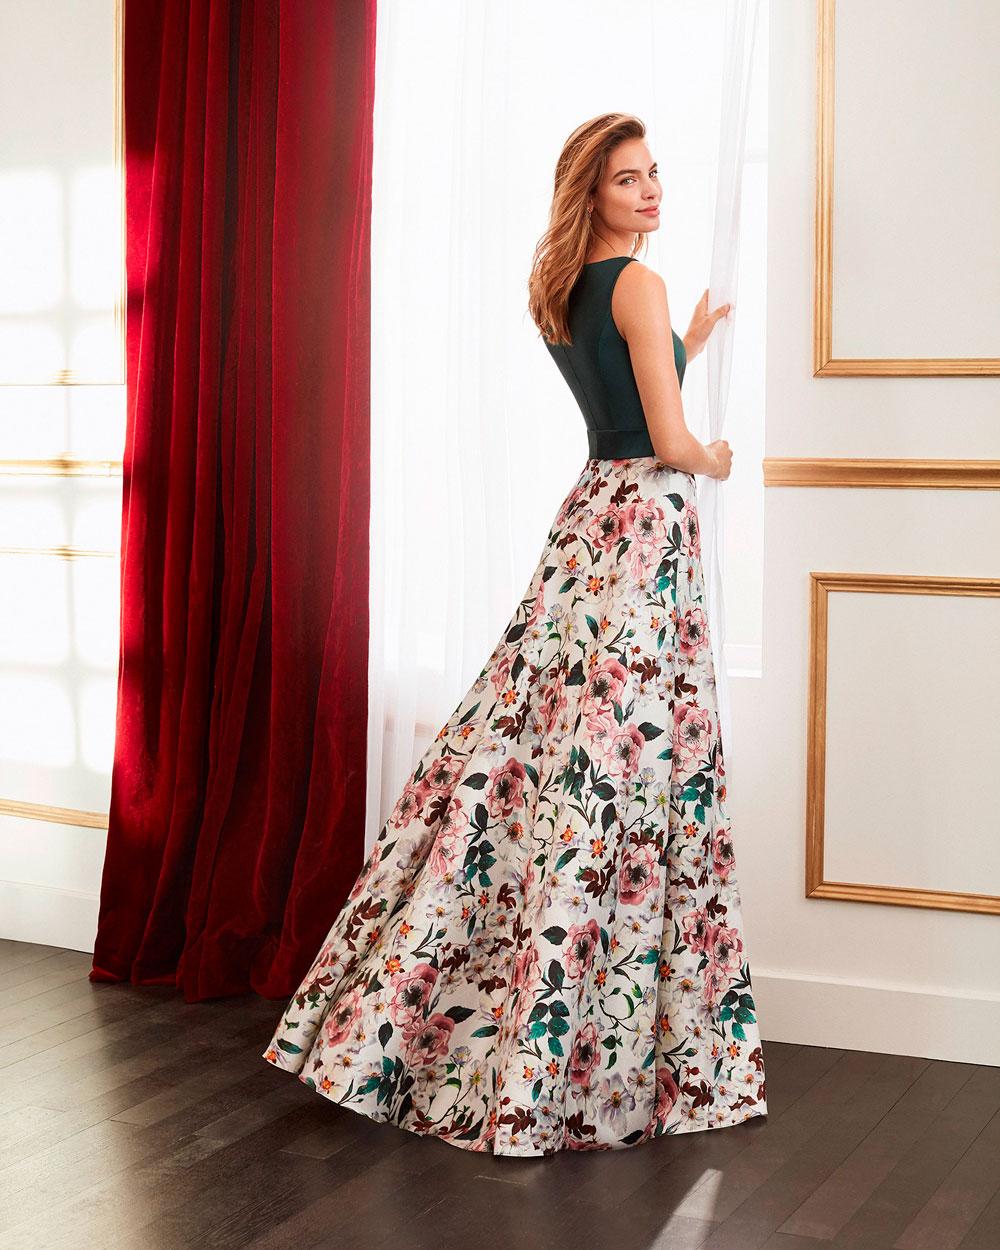 vestido de fiesta 2020 4J2D3 MARFIL BARCELONA 2